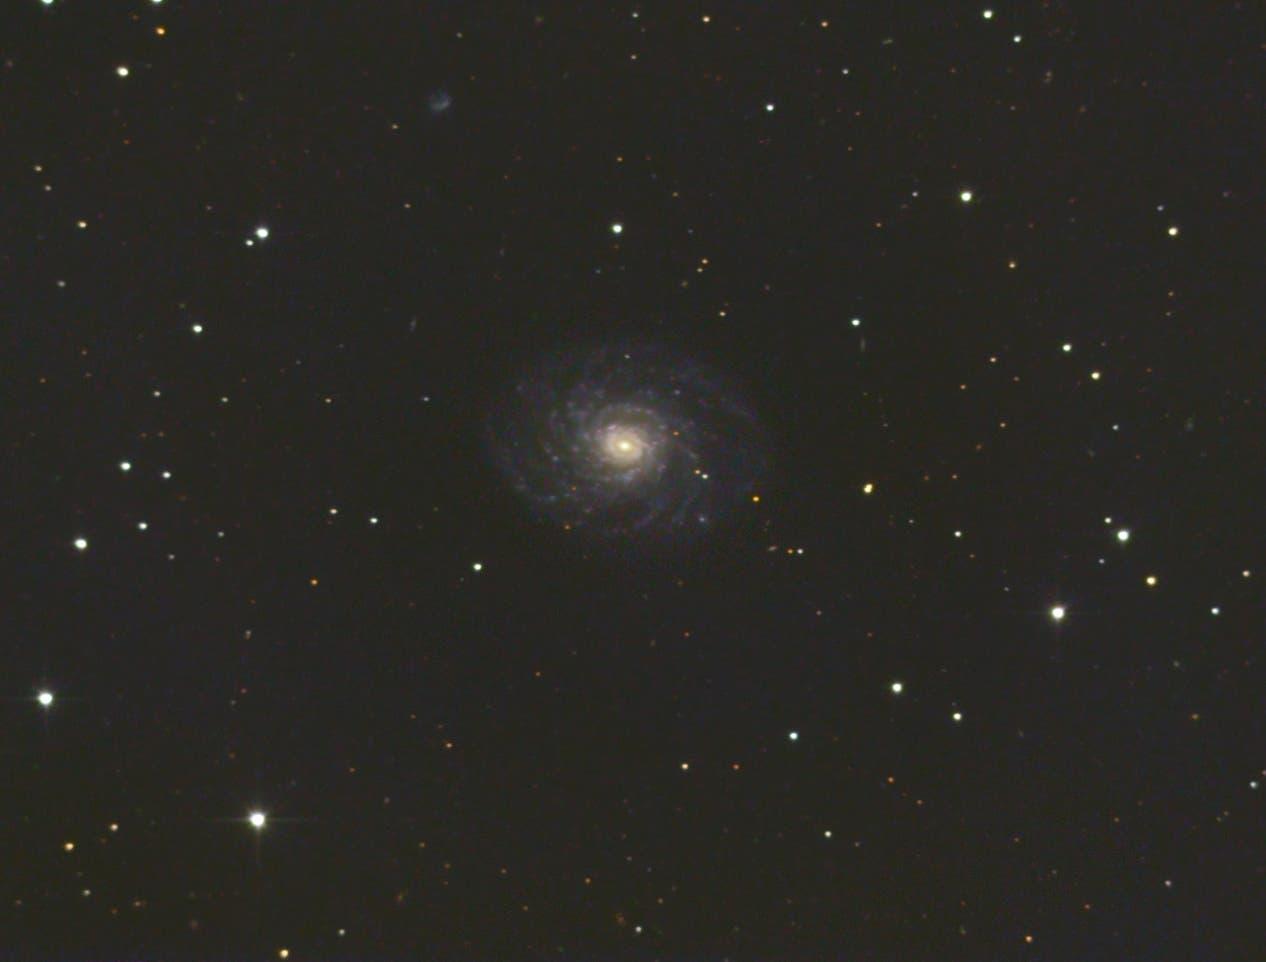 NGC 3486 in Leo Minor